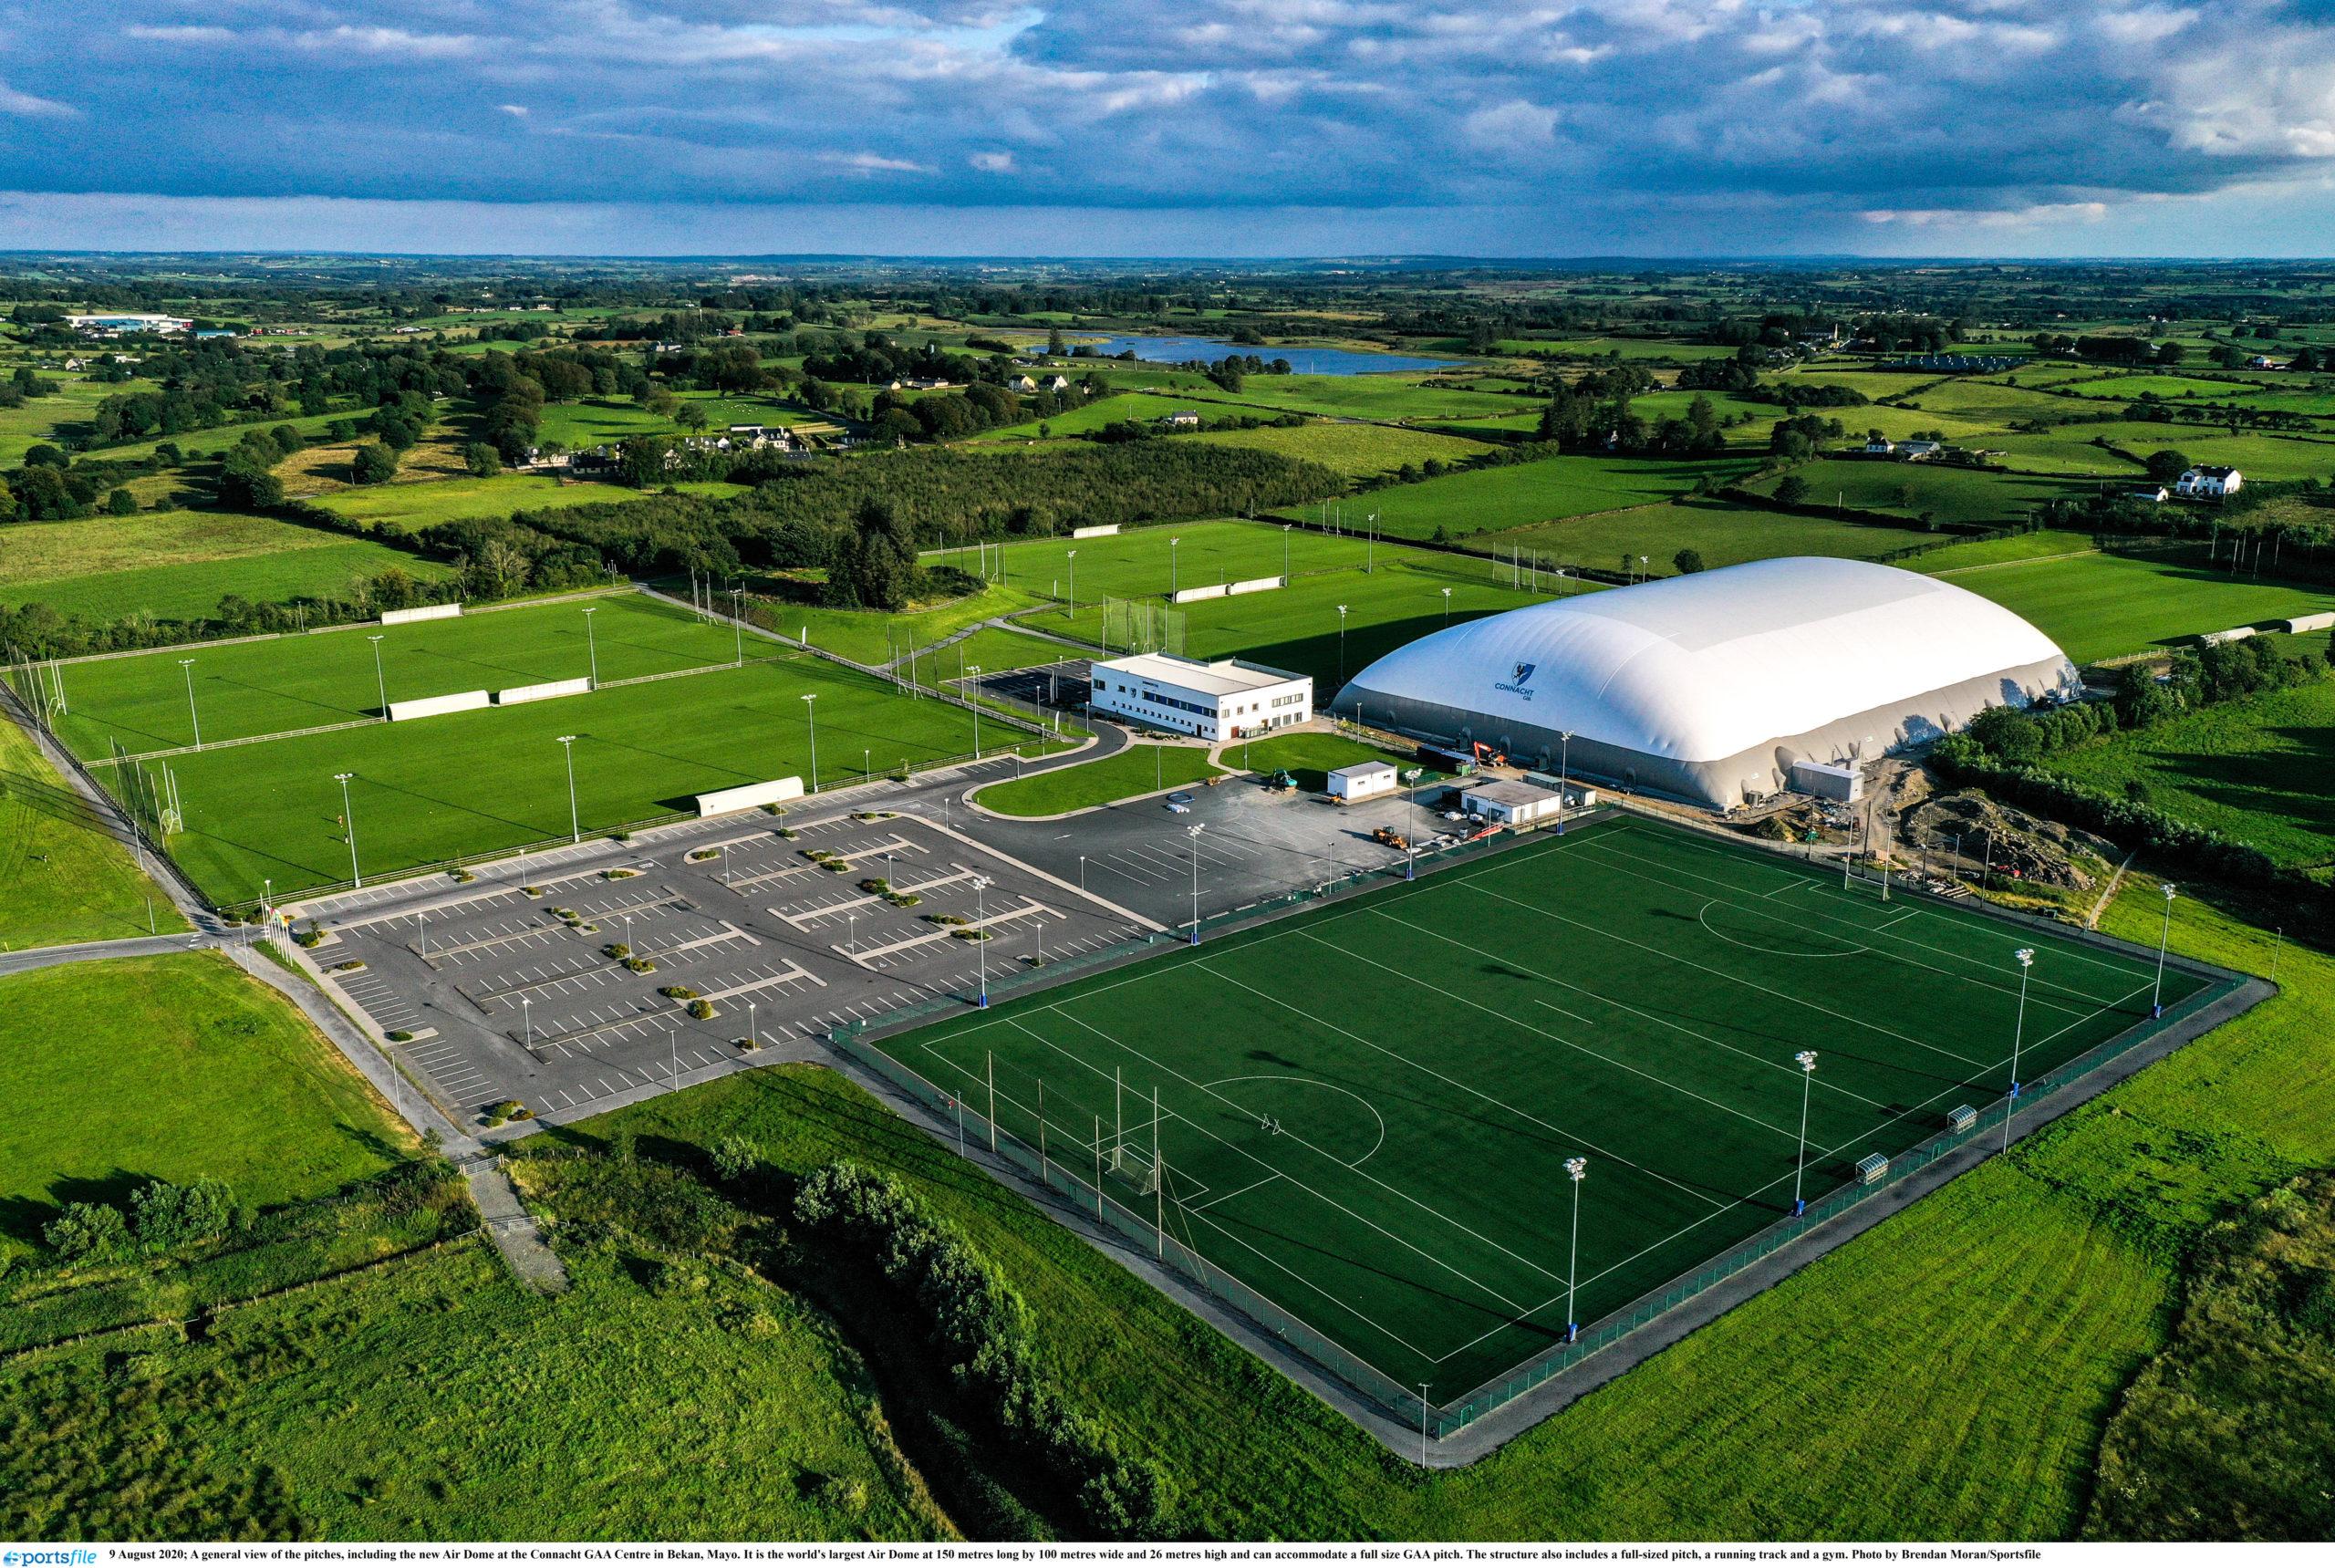 Connacht GAA Annual Report for 2020